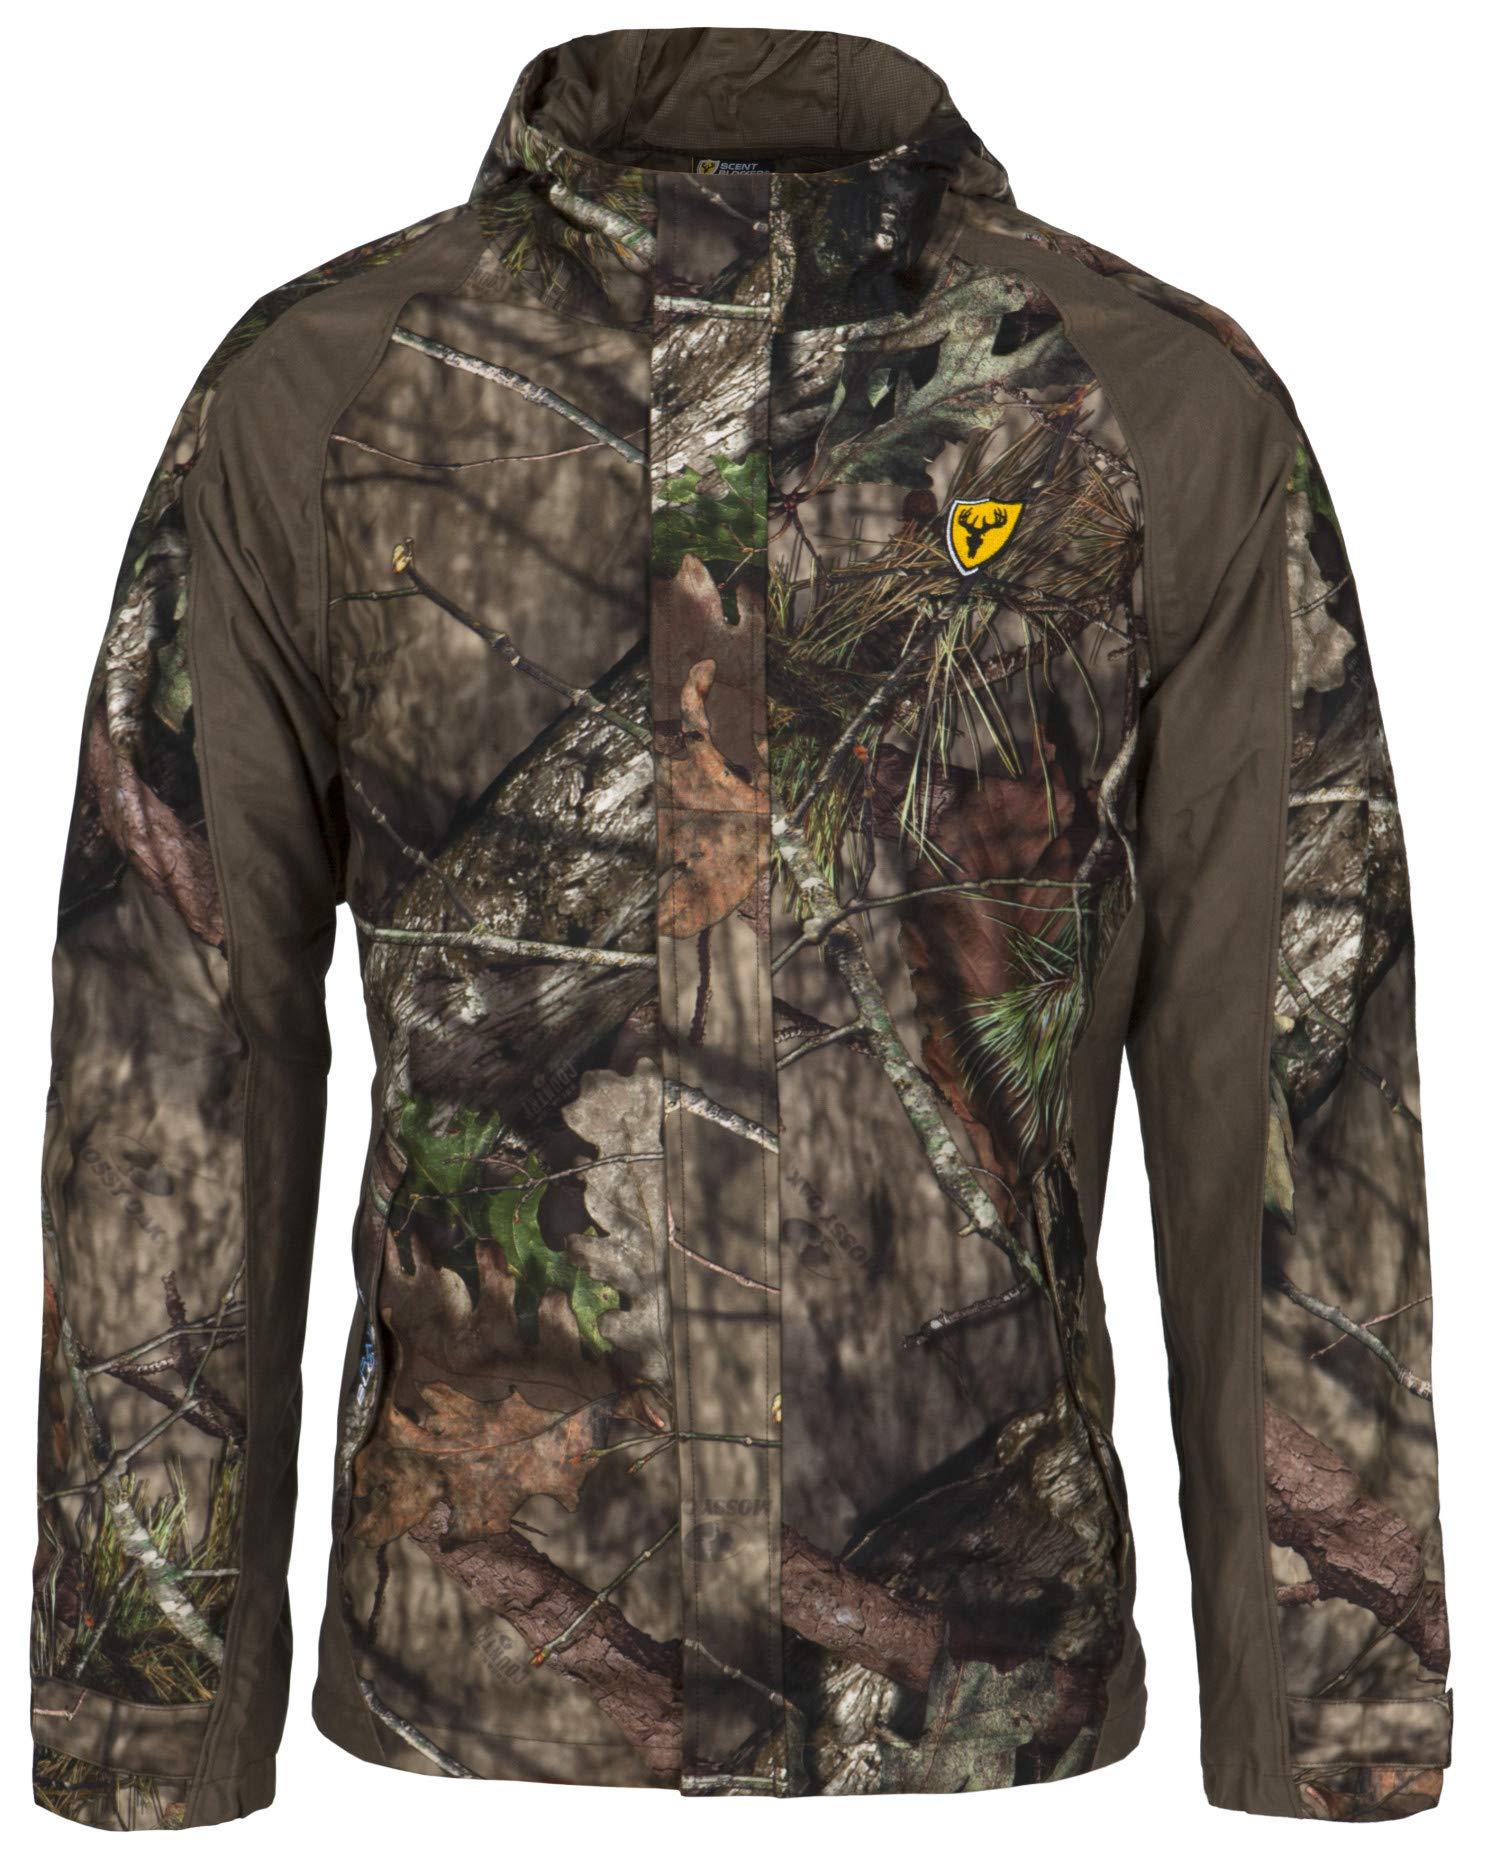 Scent Blocker Drencher Jacket with Hood, Waterproof, Odor Control, Mens - XXXL - Mossy Oak Country by Scent Blocker